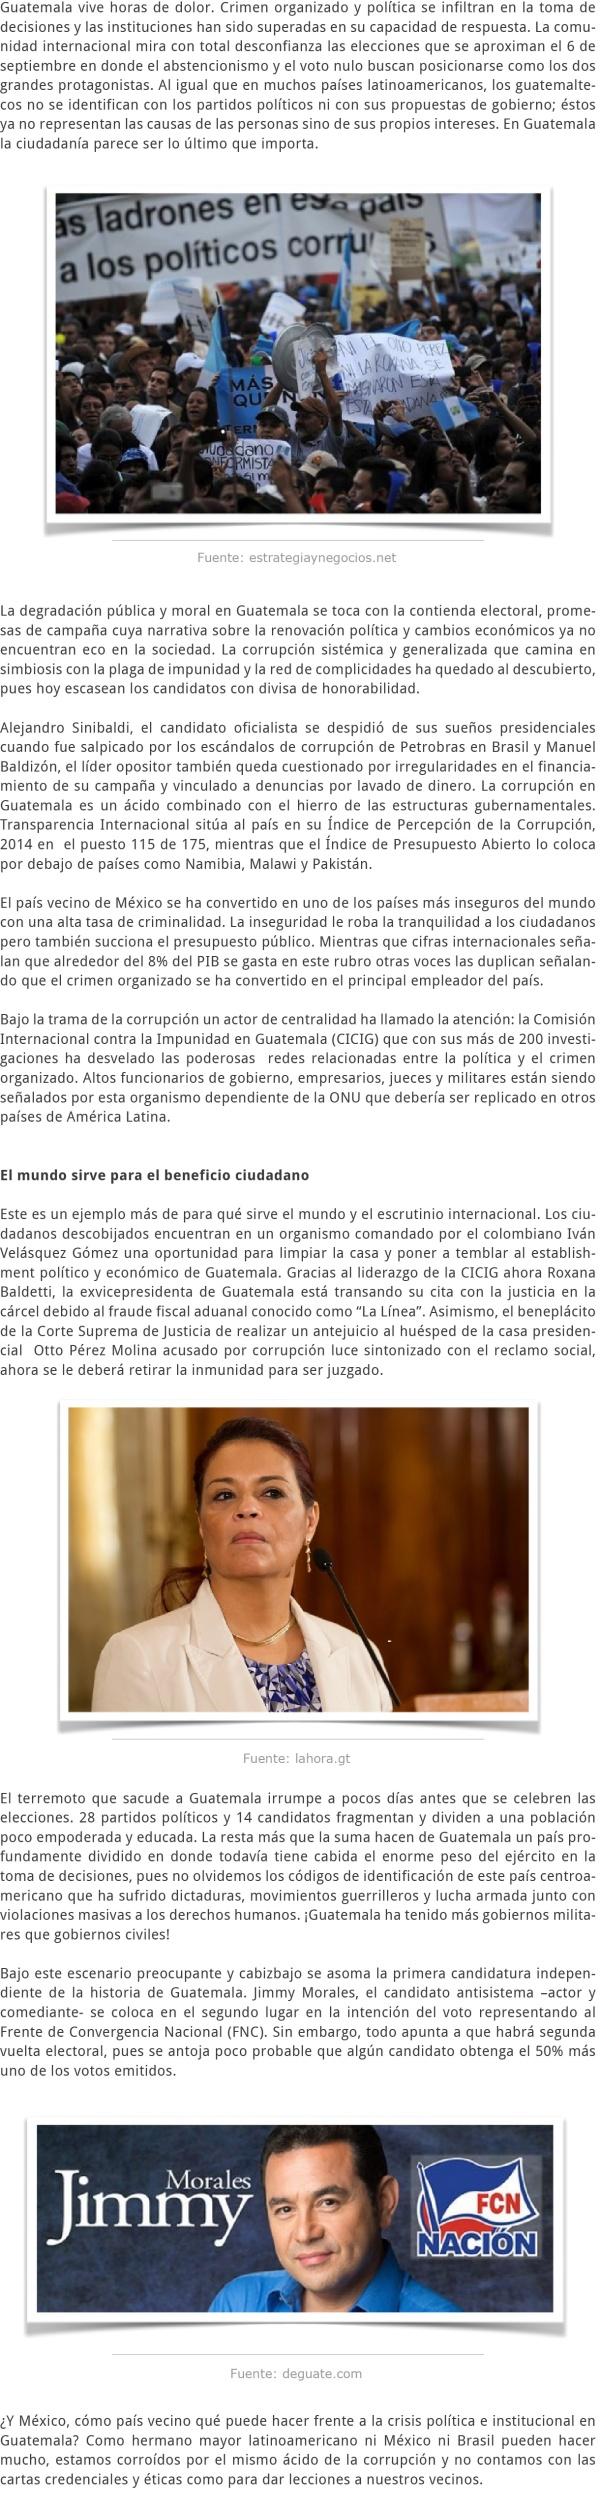 LA CRISIS SOLITARIA DE GUATEMALA